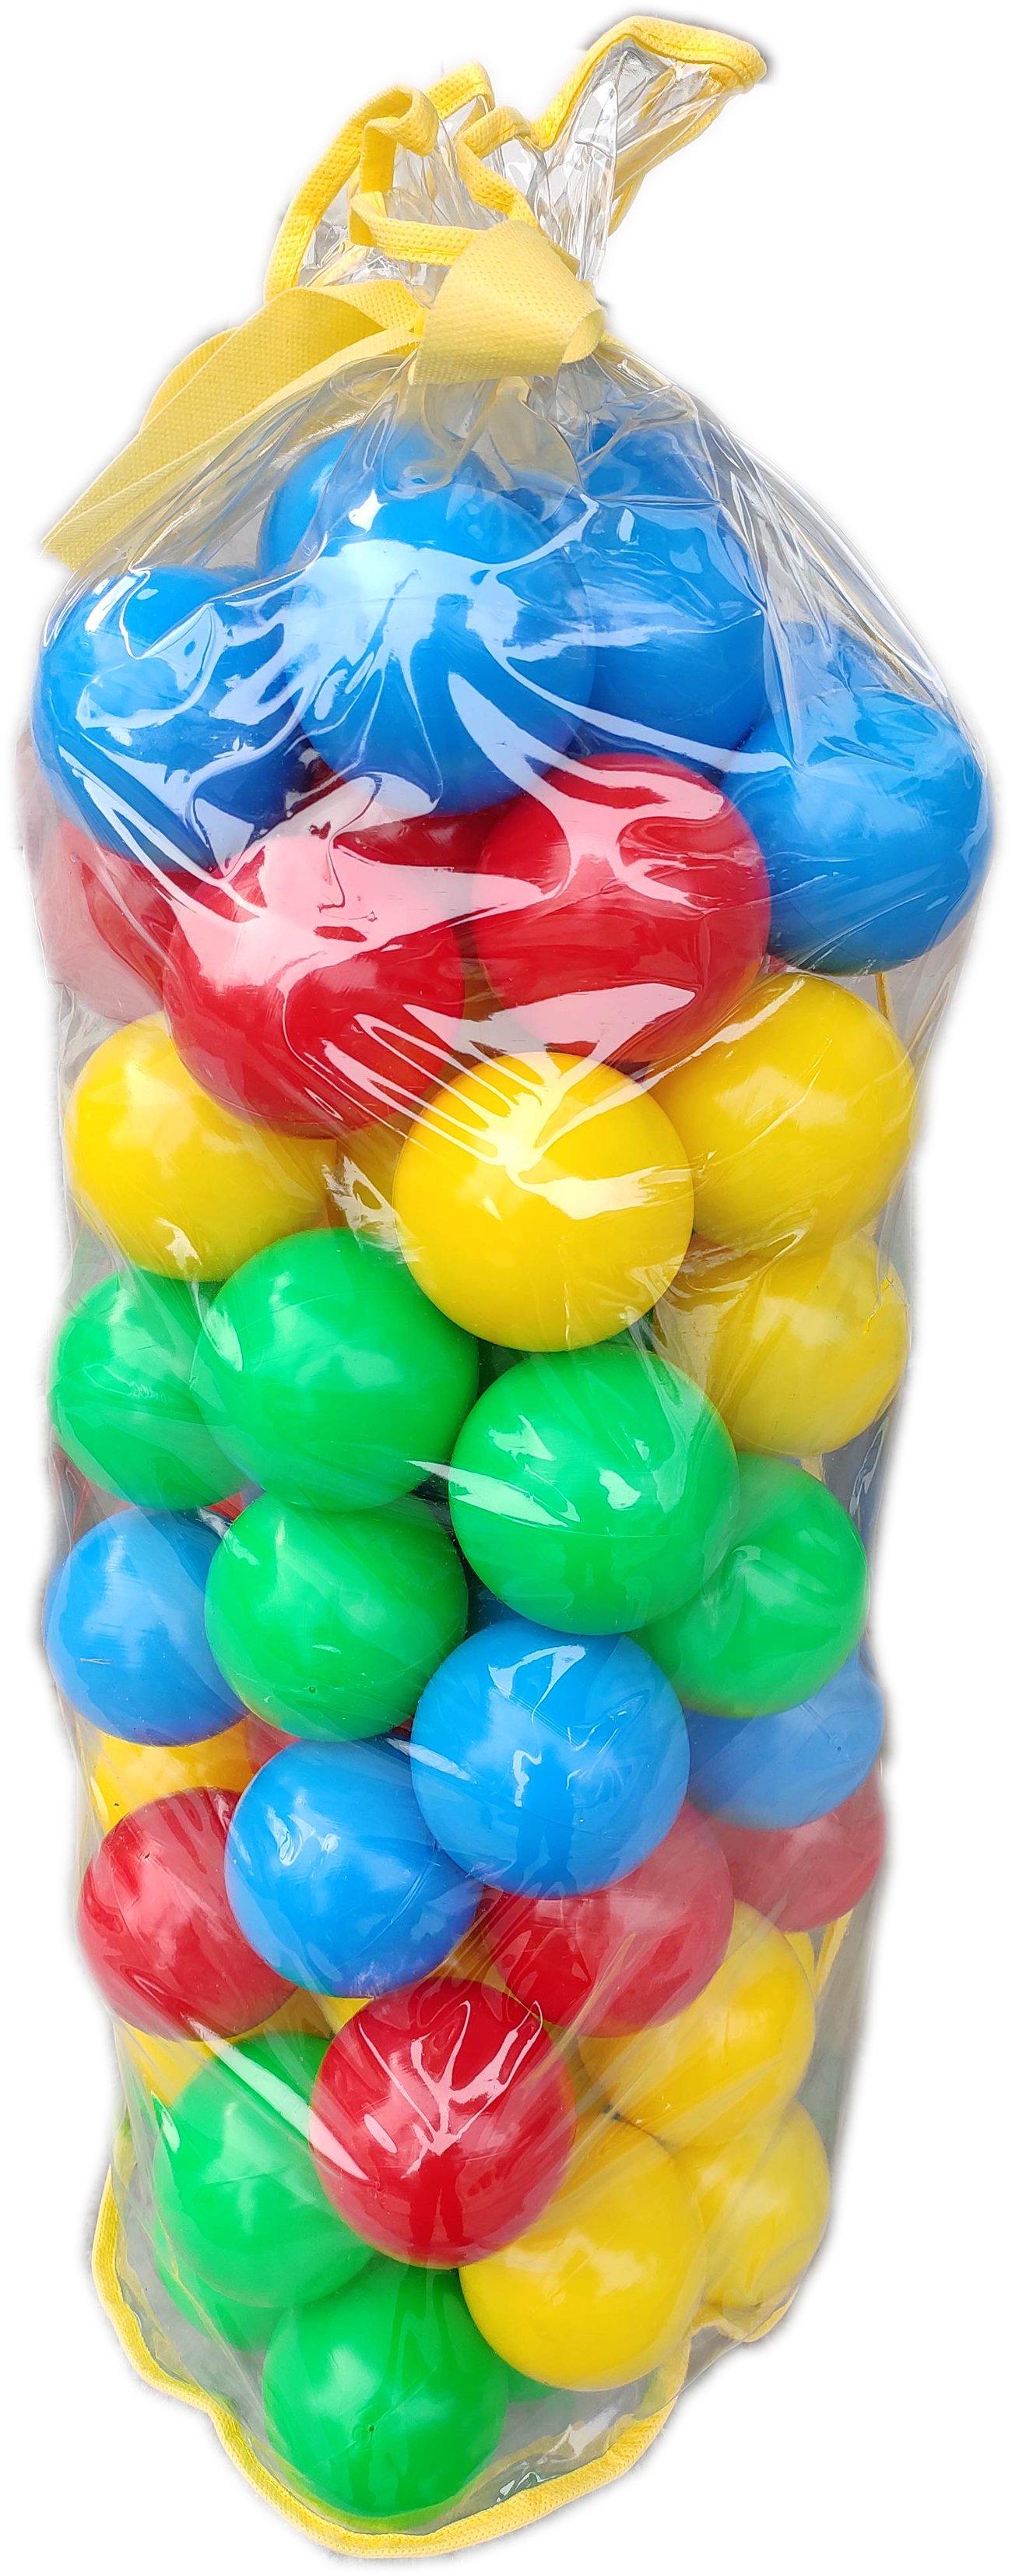 Детски Комплект пластмасови топки за игра в детски център или басейн